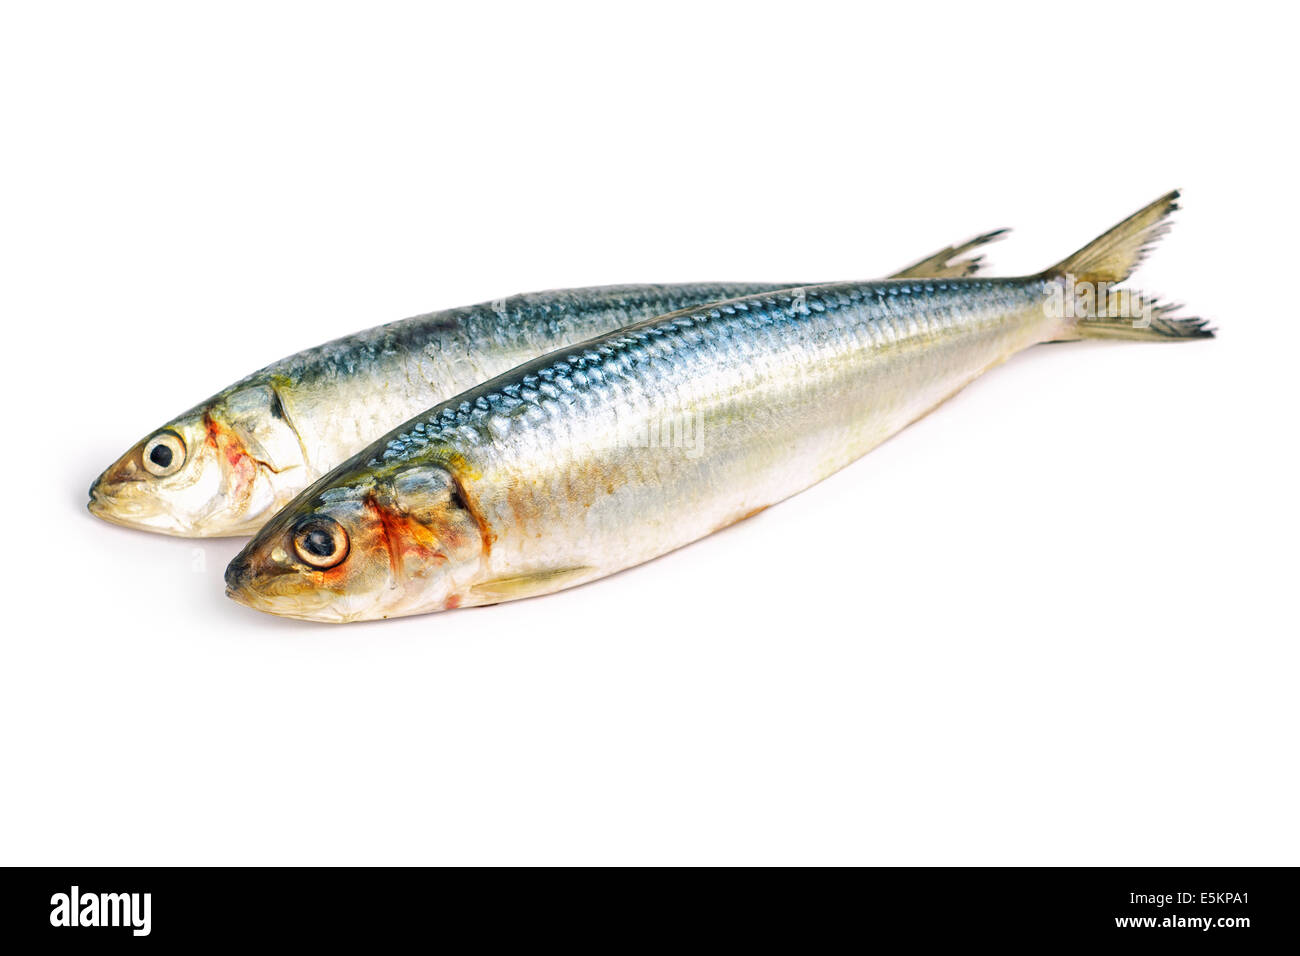 Les sardines, sardines, Sardines Deux Photo Stock